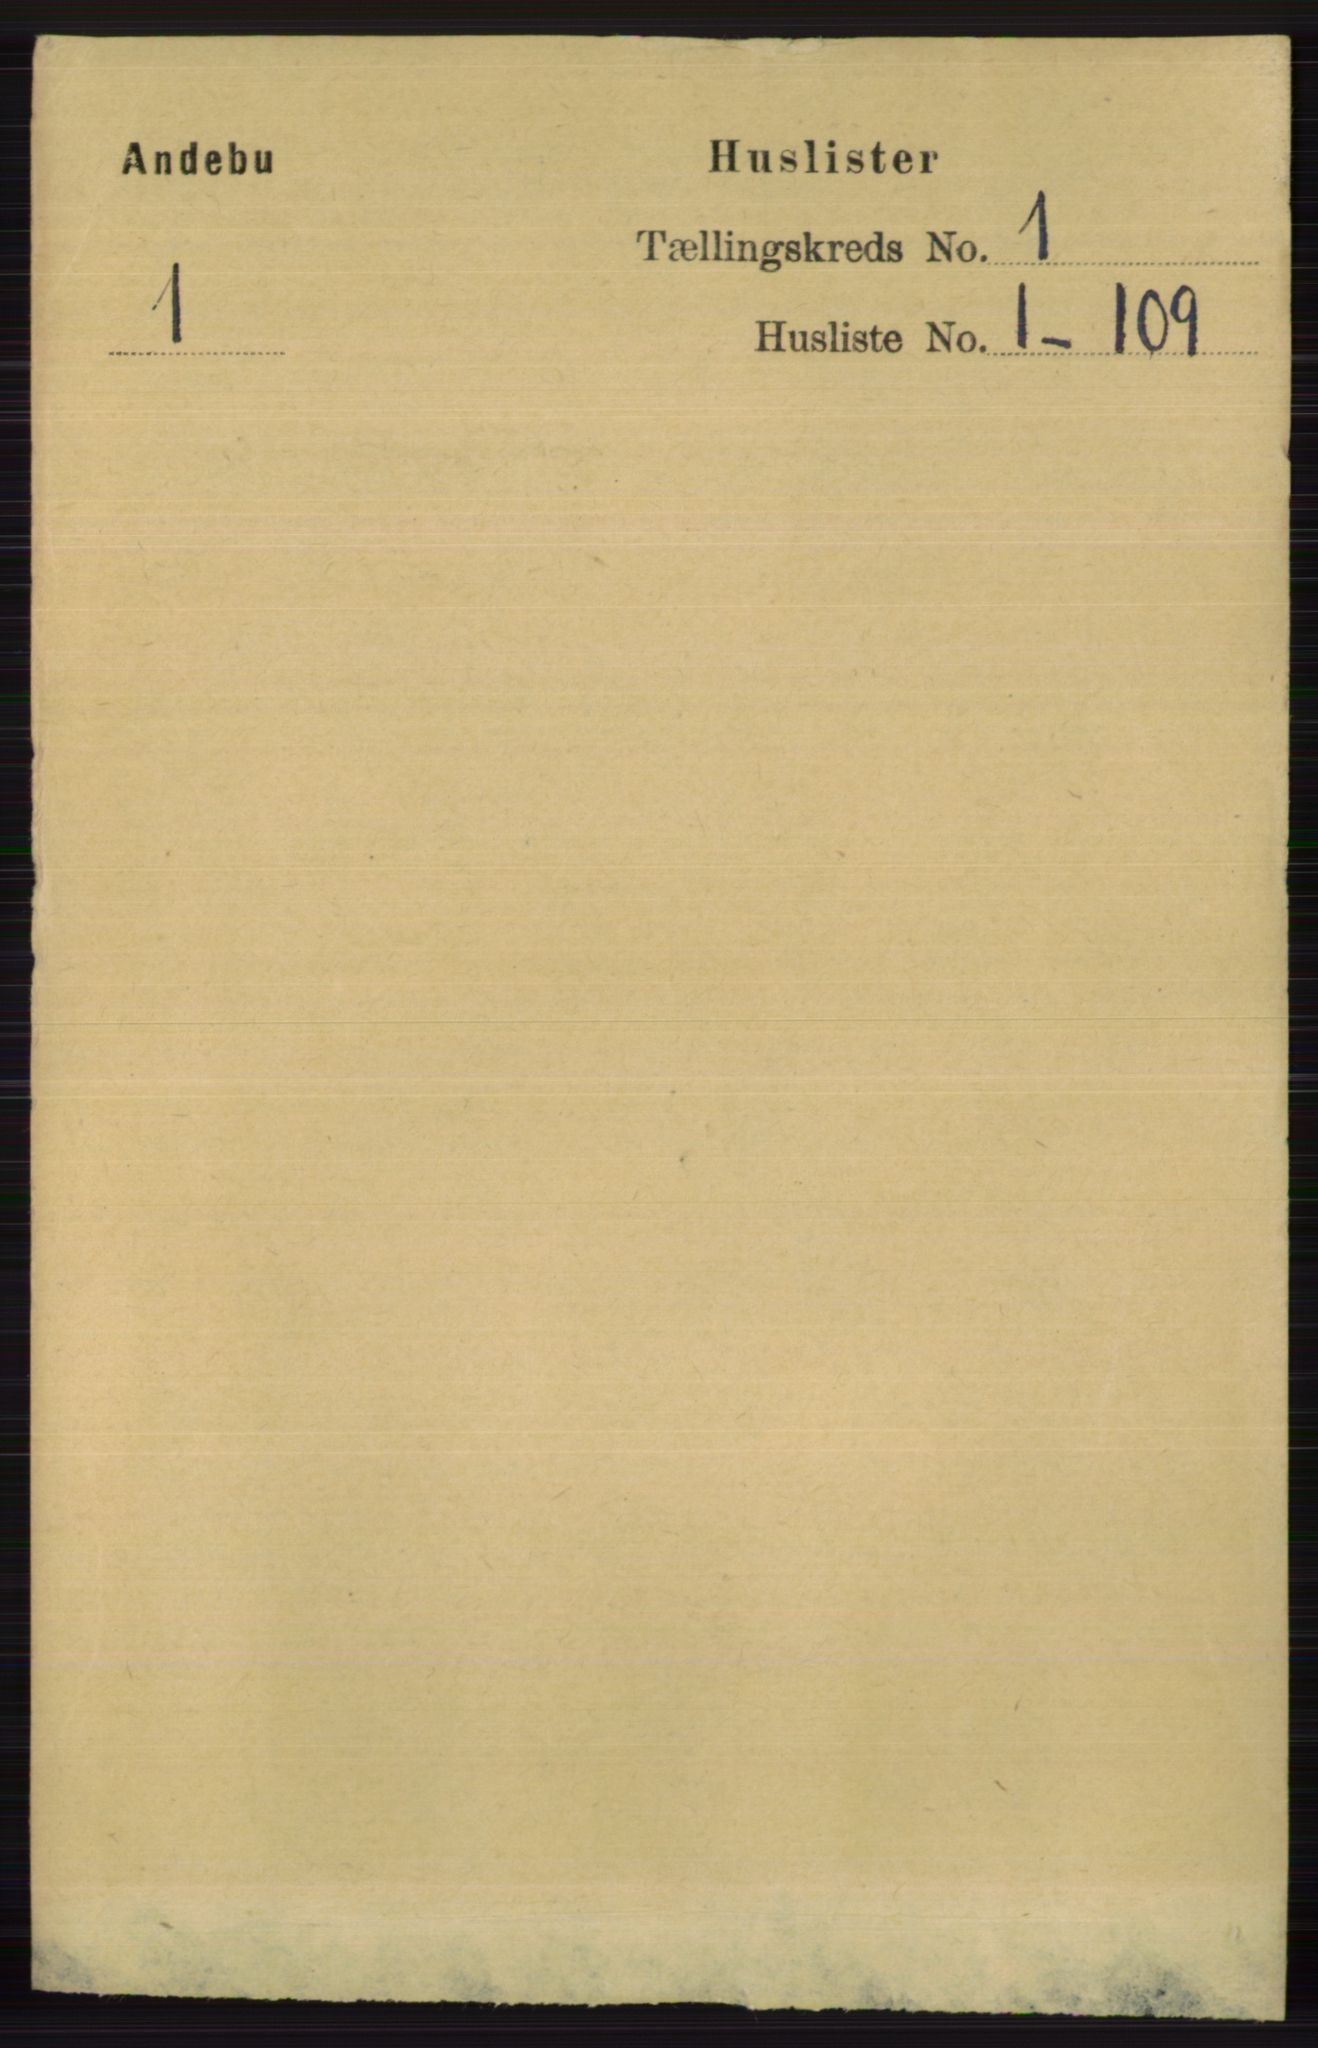 RA, Folketelling 1891 for 0719 Andebu herred, 1891, s. 27